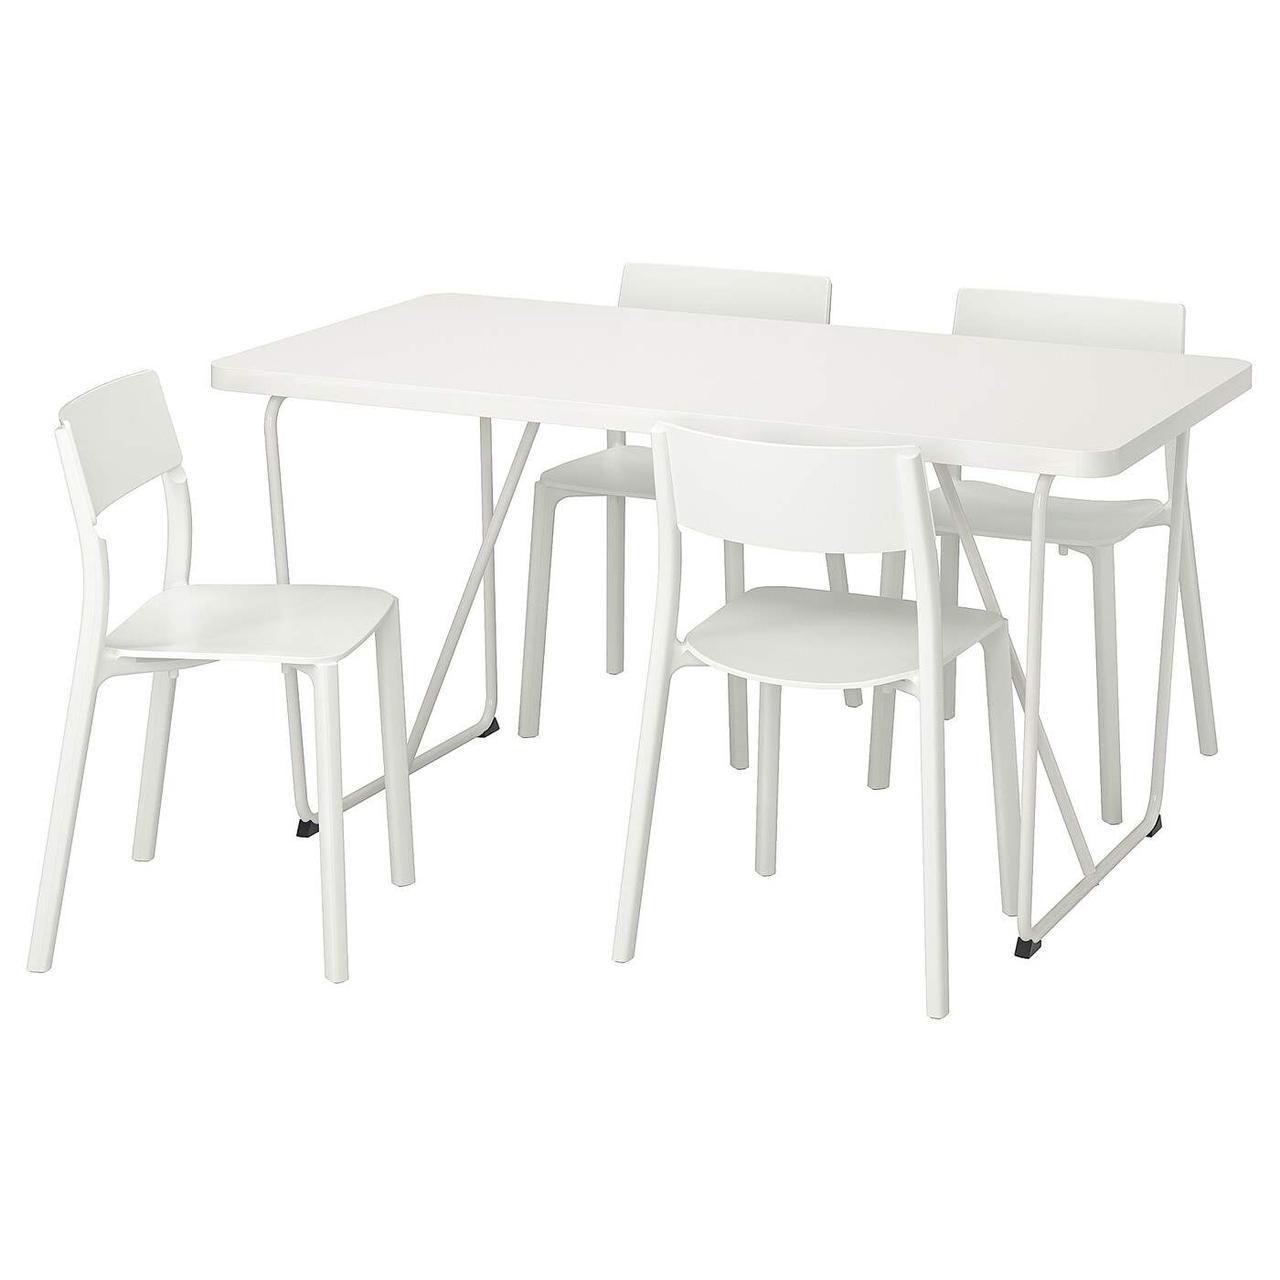 Стол и 4 стула RYDEBACK/BACKARYD / JANINGE